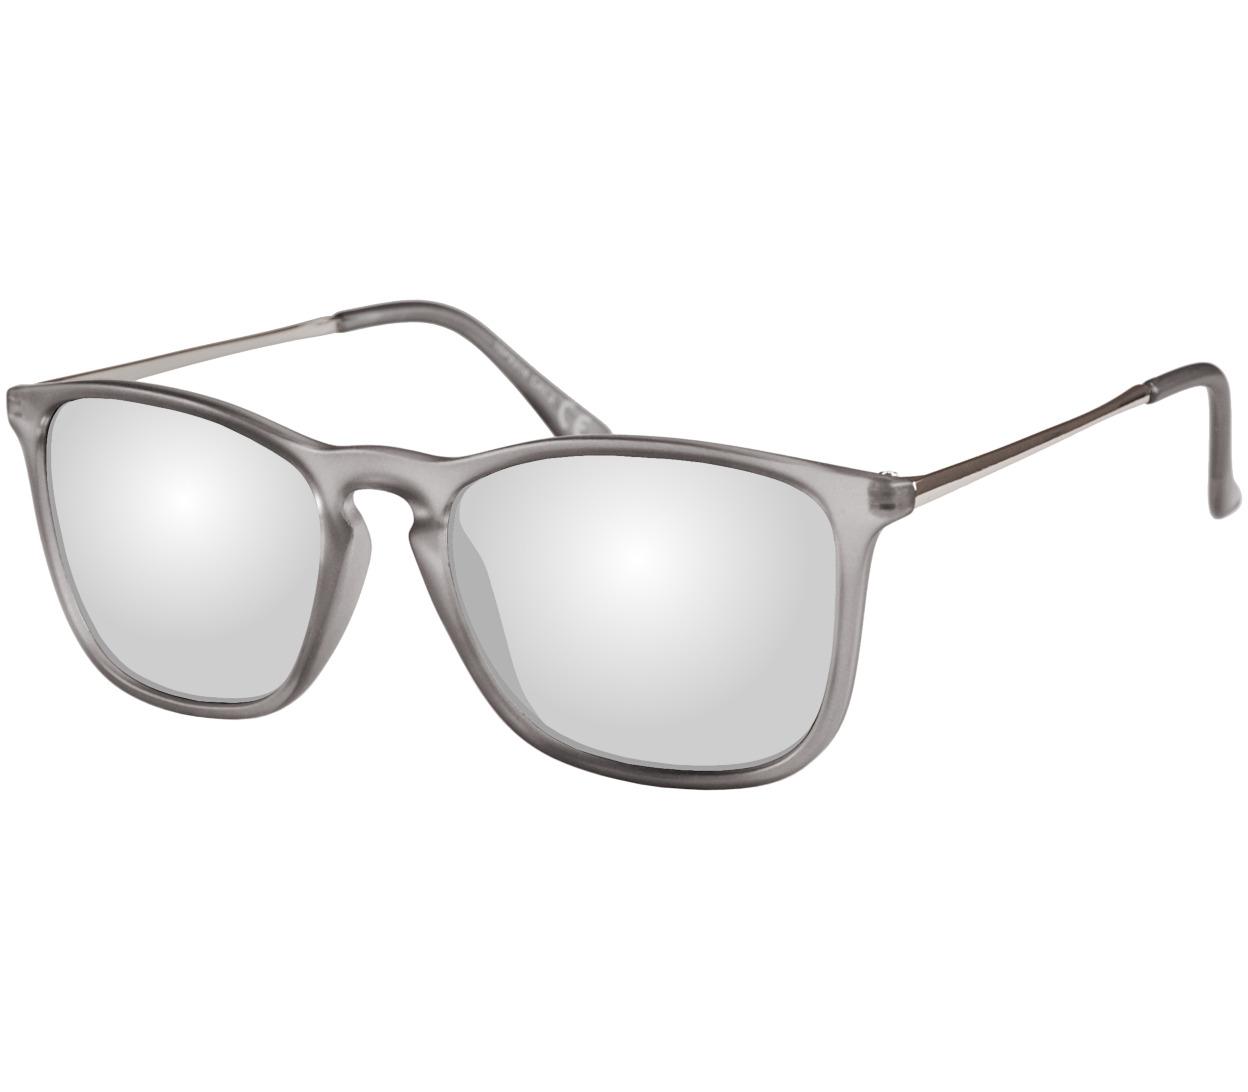 Main Image (Angle) - Toledo (Grey) Retro Sunglasses